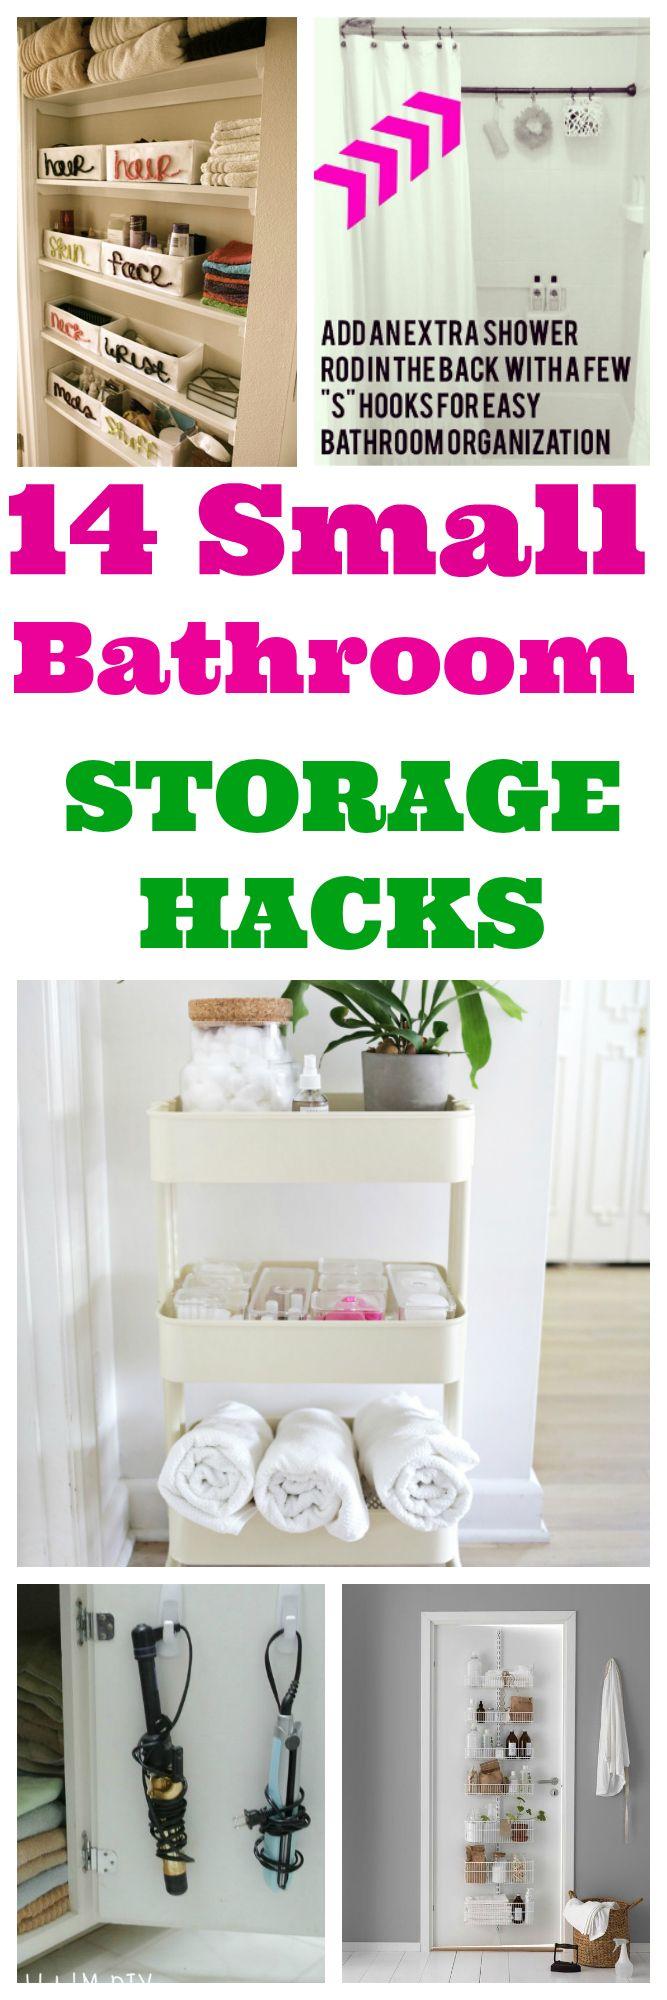 Small Bathroom Ideas Including 14 Storage Solutions Decor Ideas Impressive Tips For Small Bathrooms Design Decoration